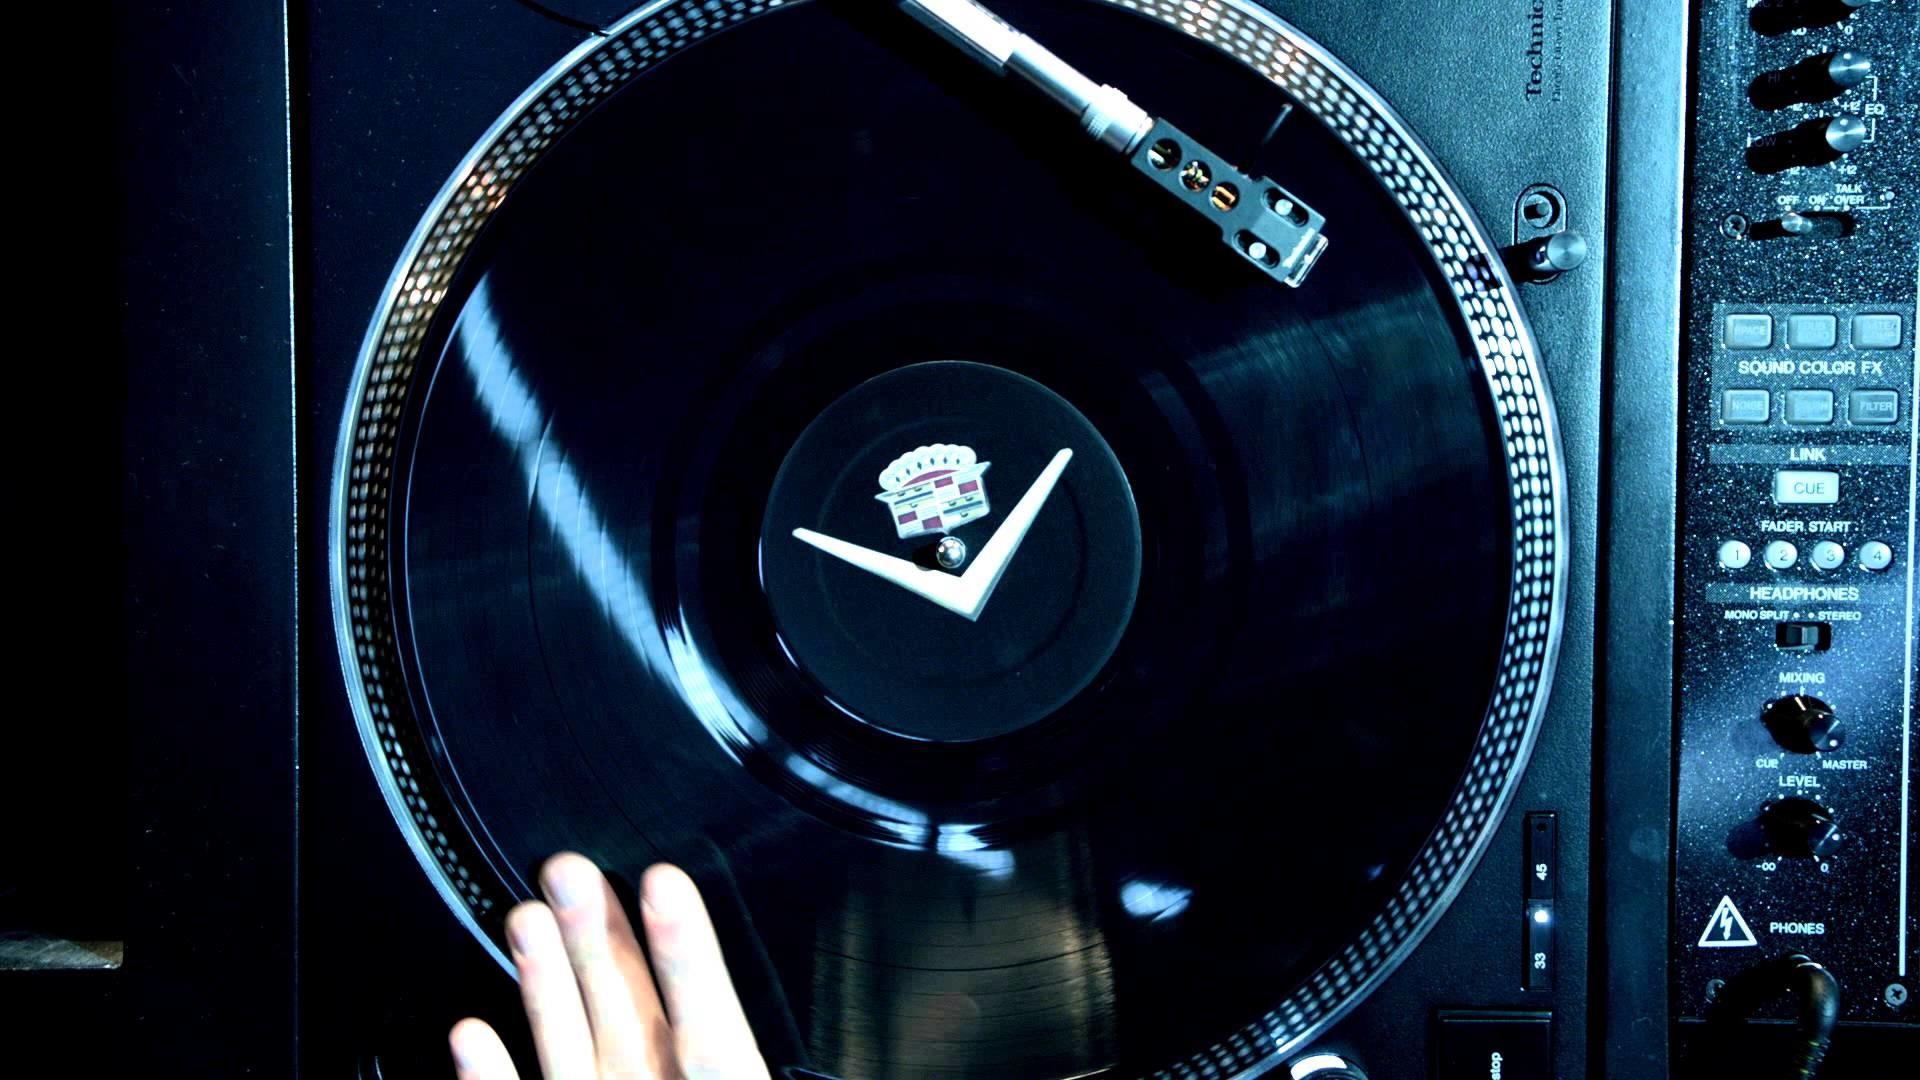 dj-a-track-2015-cadillac-ats- .